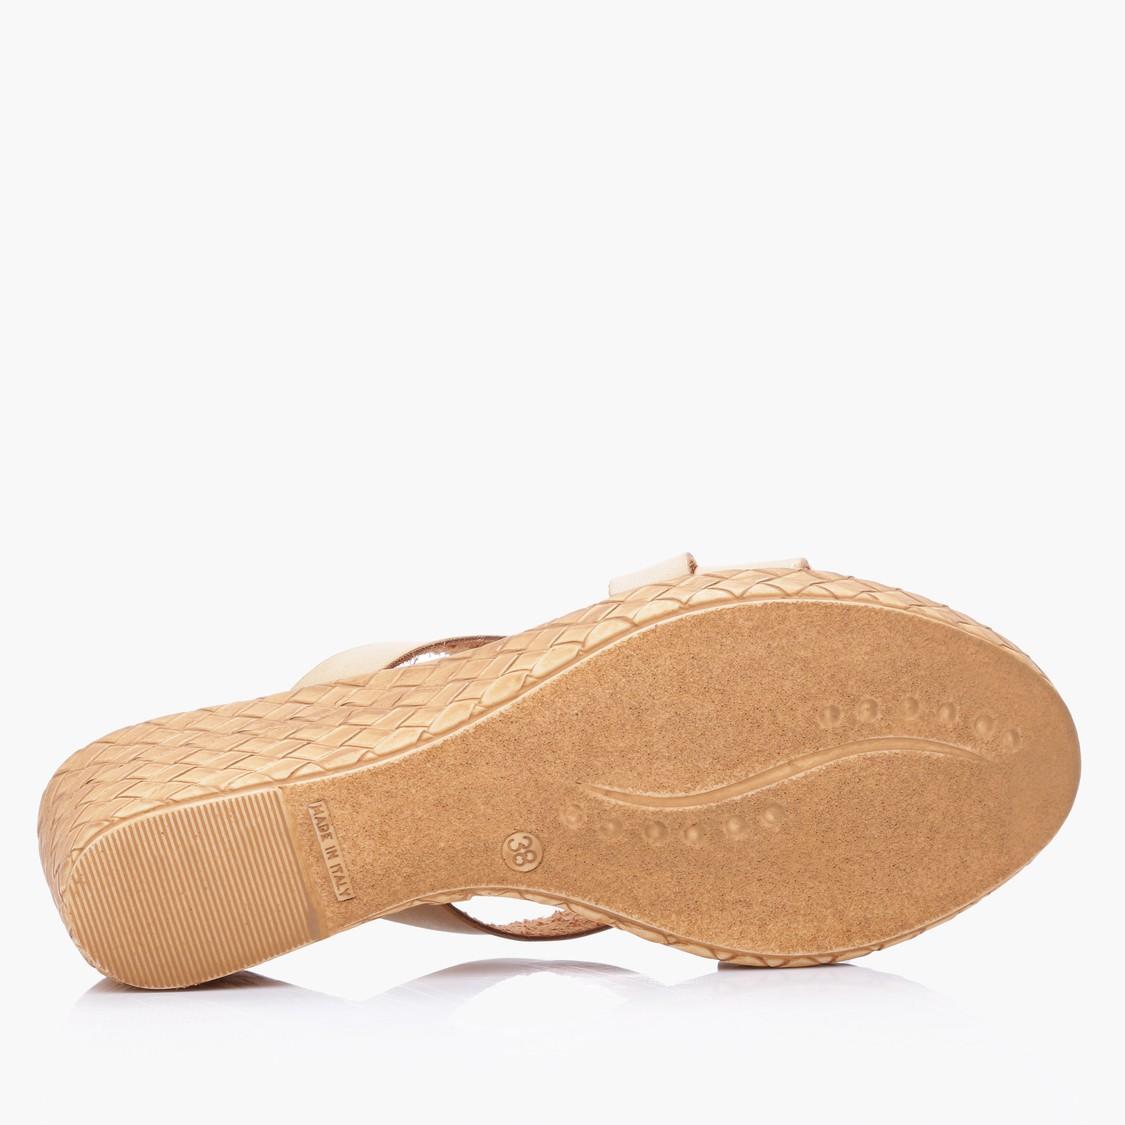 Textured Slip-On Wedges